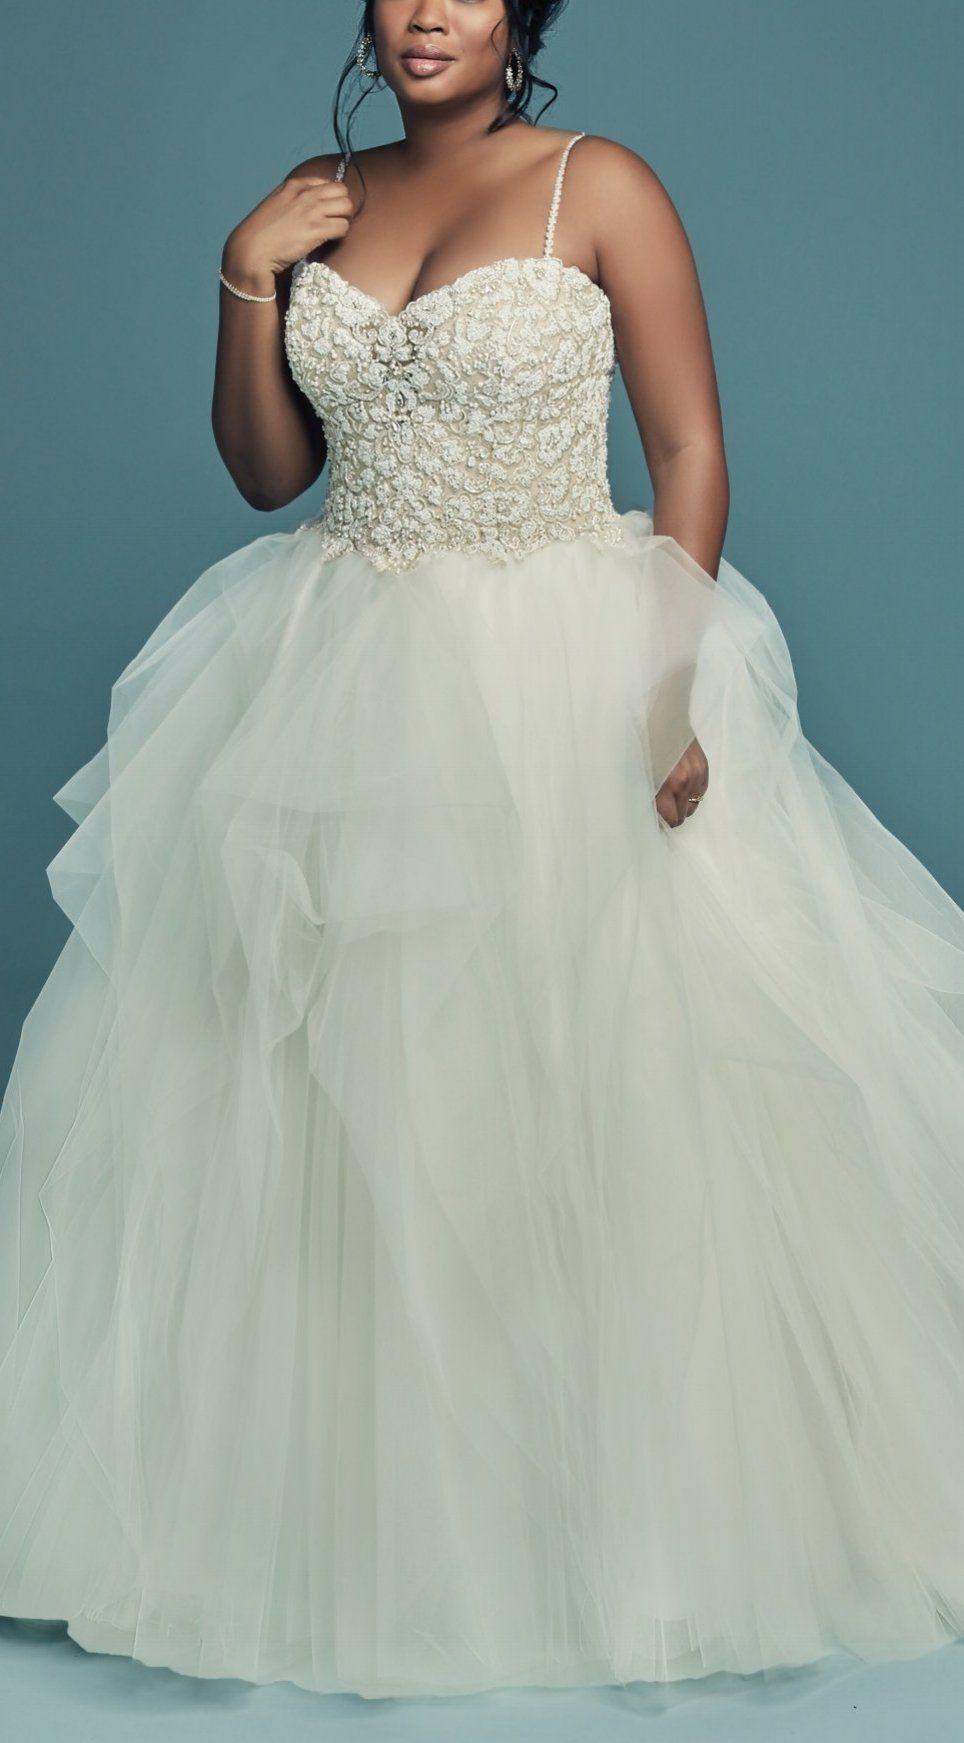 Wedding Dresses Bridal Gowns Wedding Dresses Wedding Dresses Xl Bridal Dresses [ 1743 x 964 Pixel ]